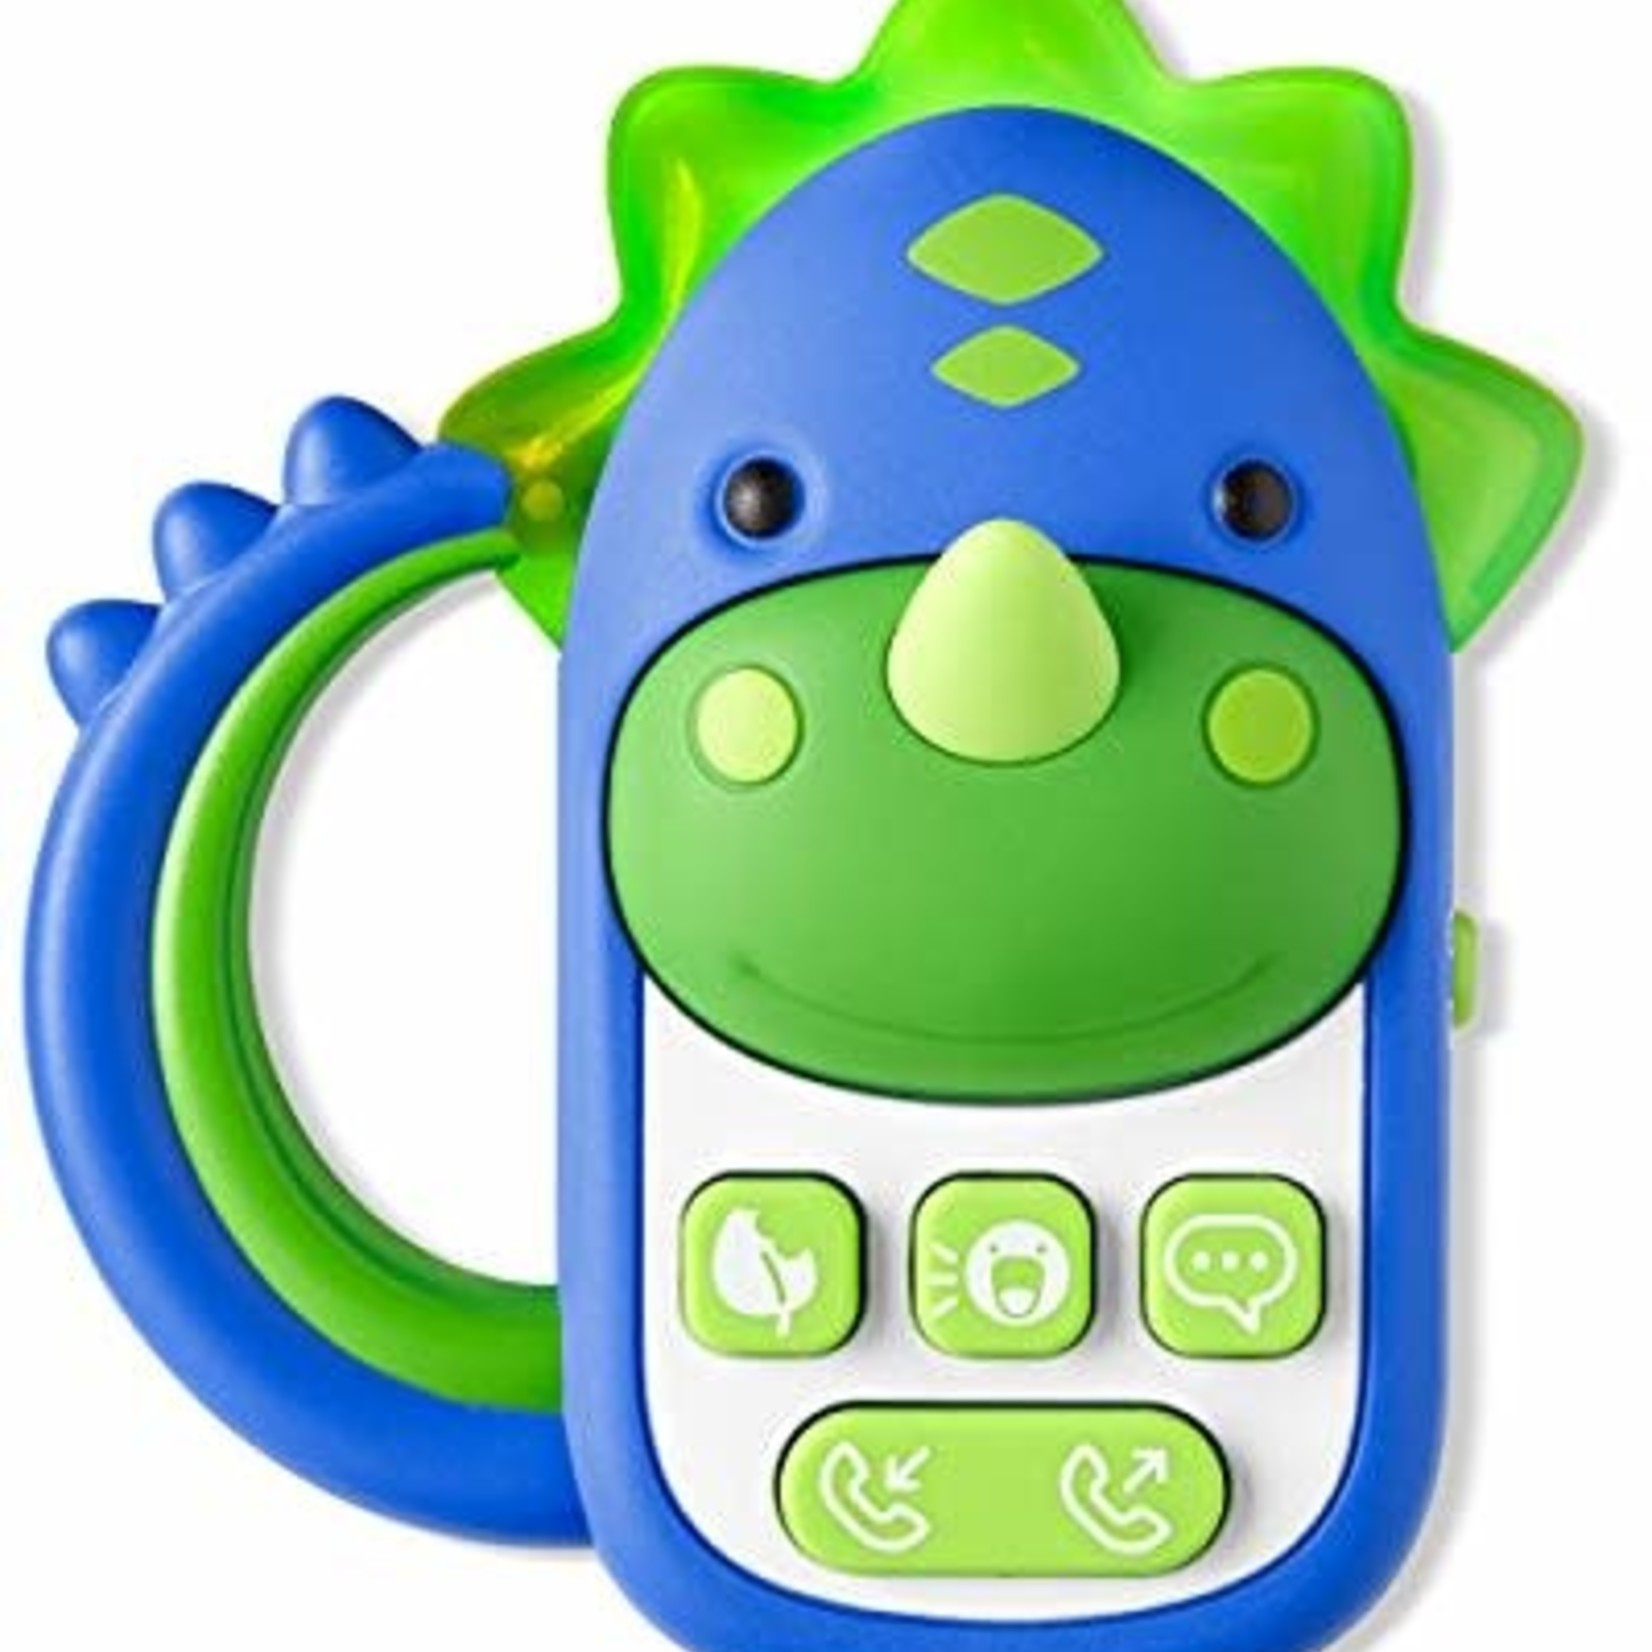 SKIP HOP Preschool Toys - Zoo Dino Phone